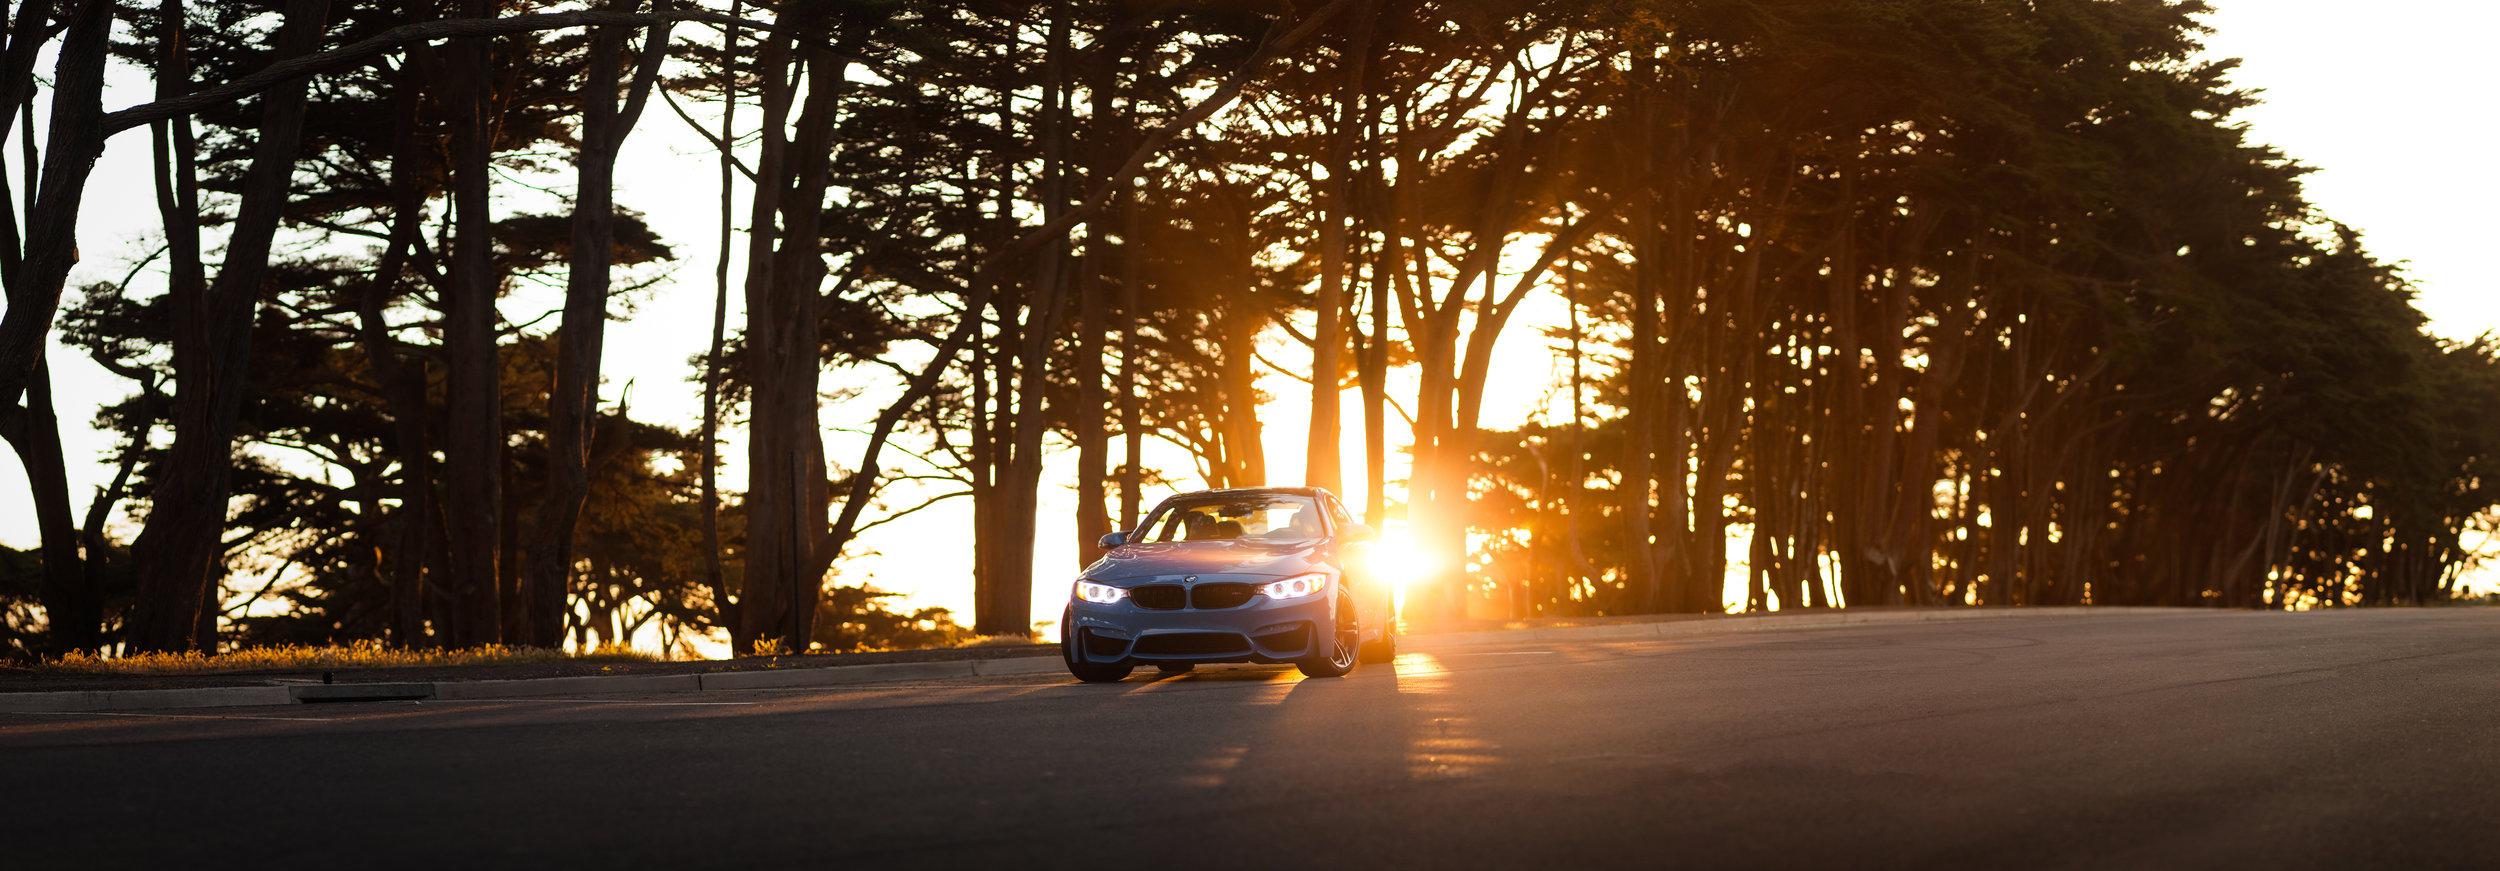 SF Sunset Original Compilation.JPG